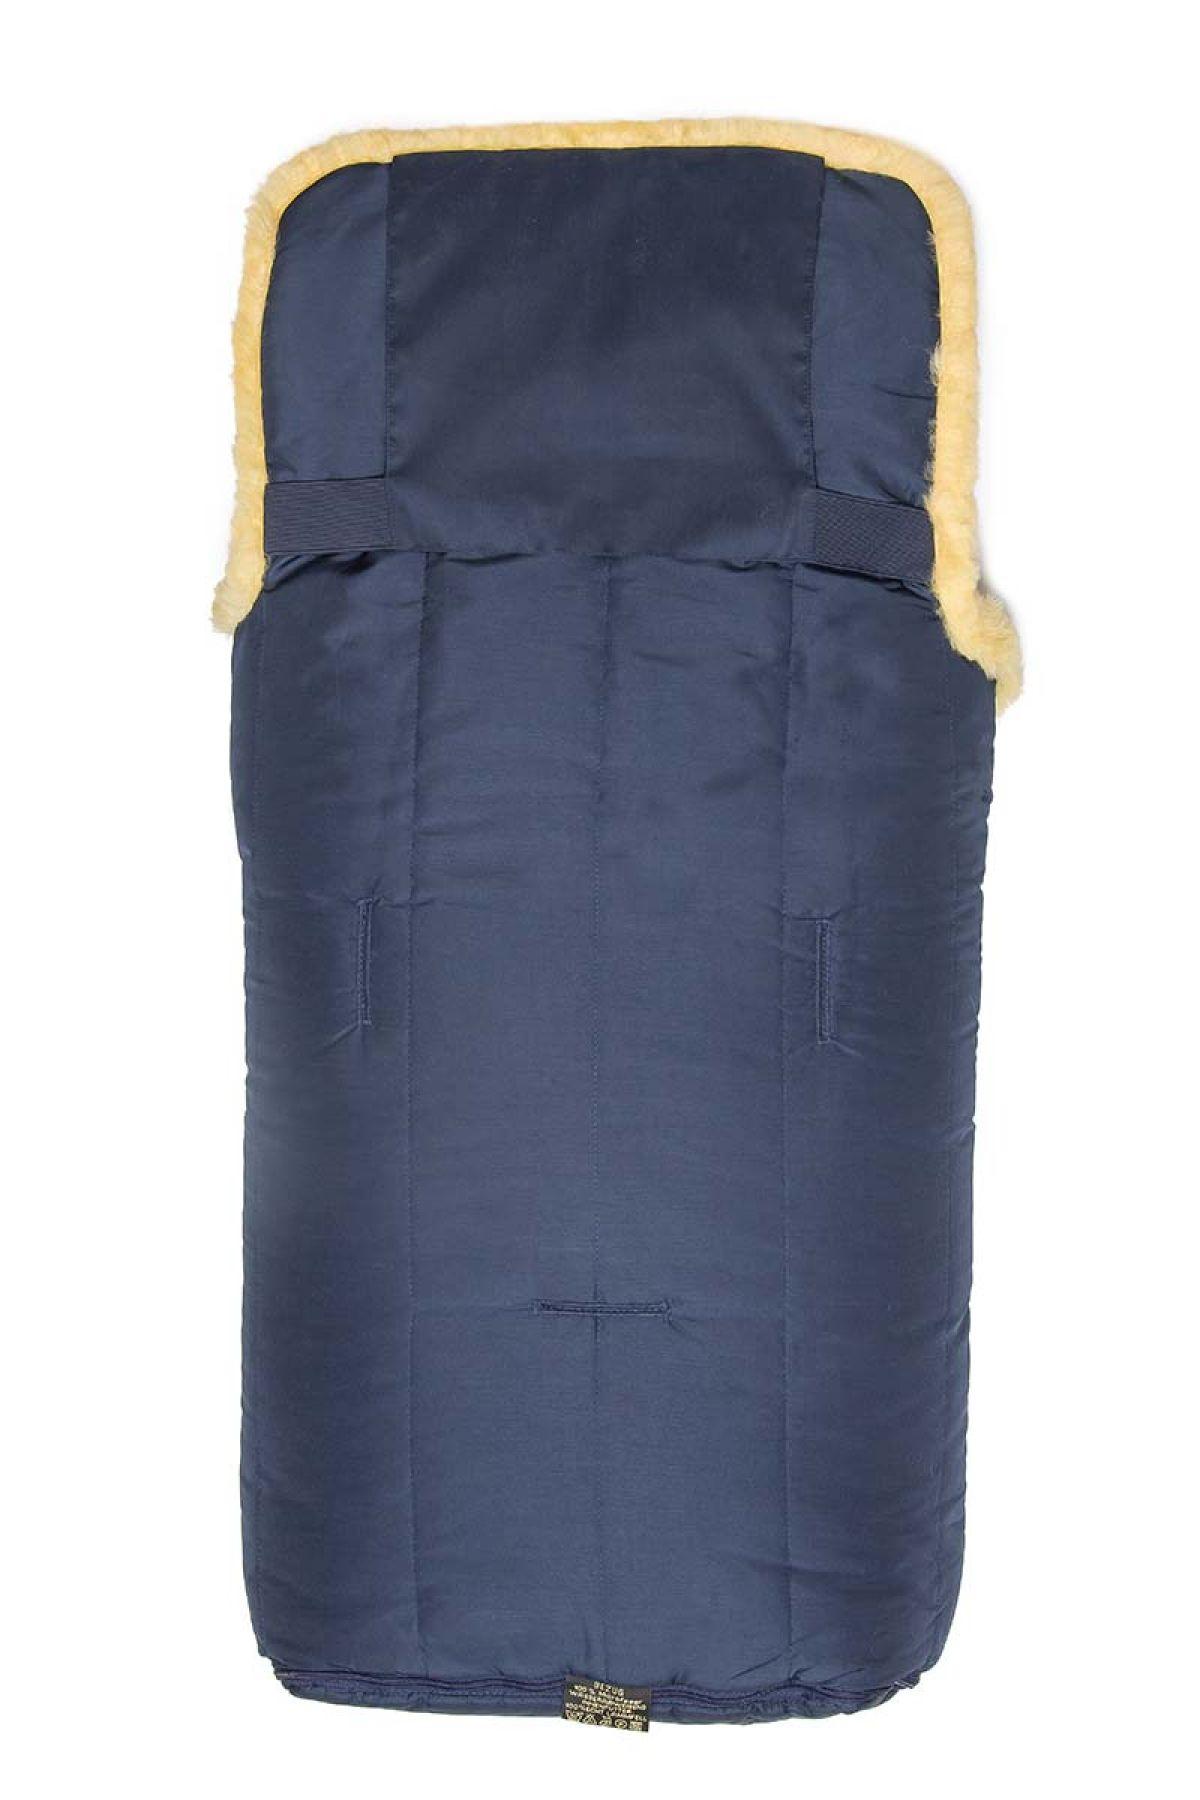 Sheepy Care Double Zippered Baby Sleeping Bag MDK011 Navy blue